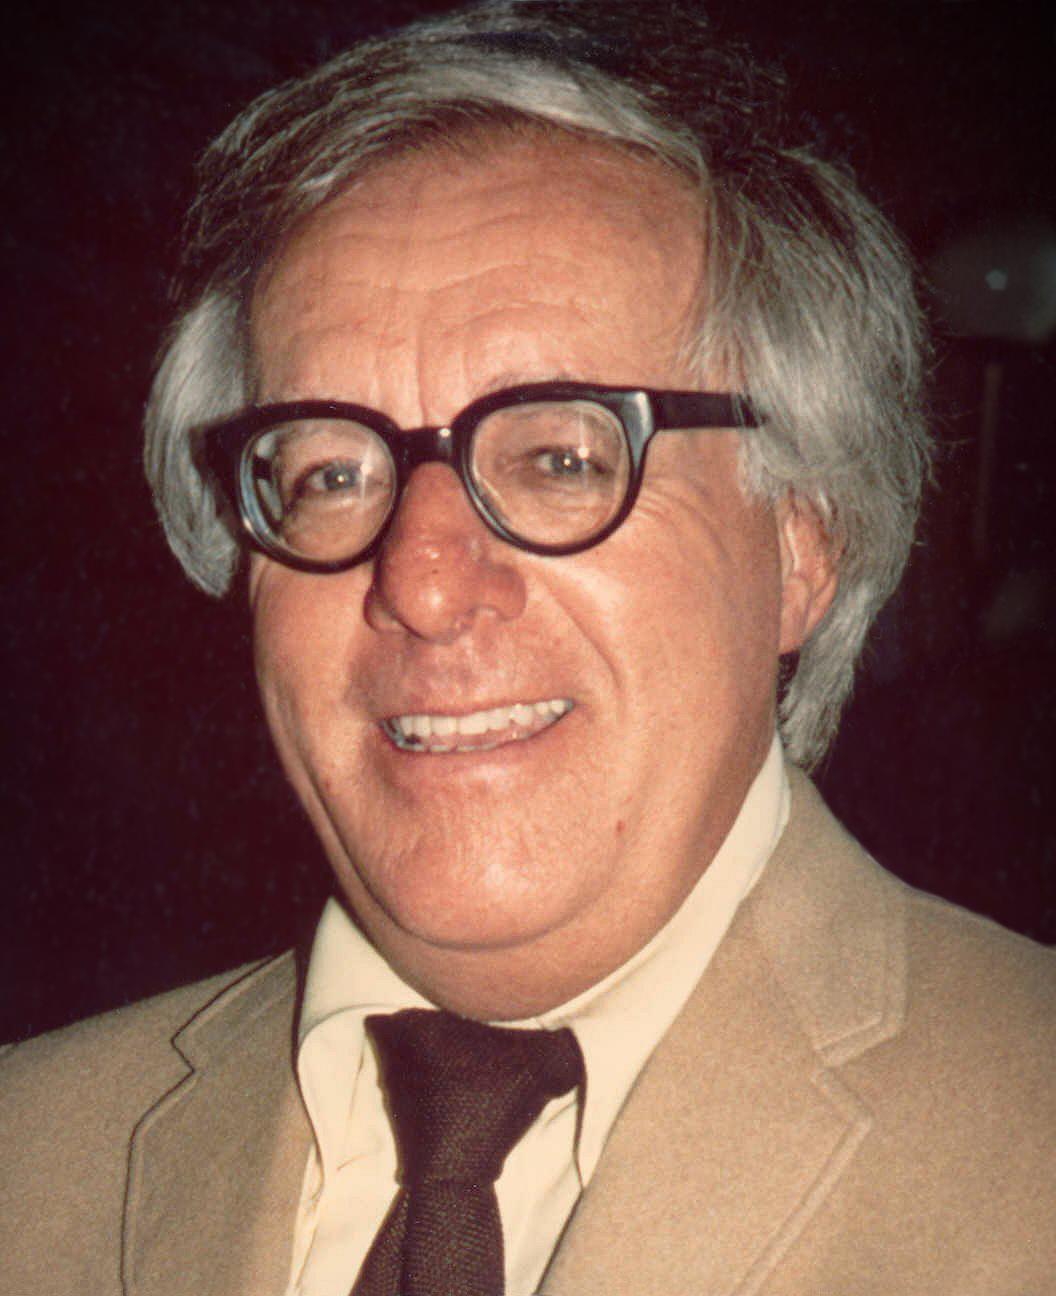 portrait of Bradbury